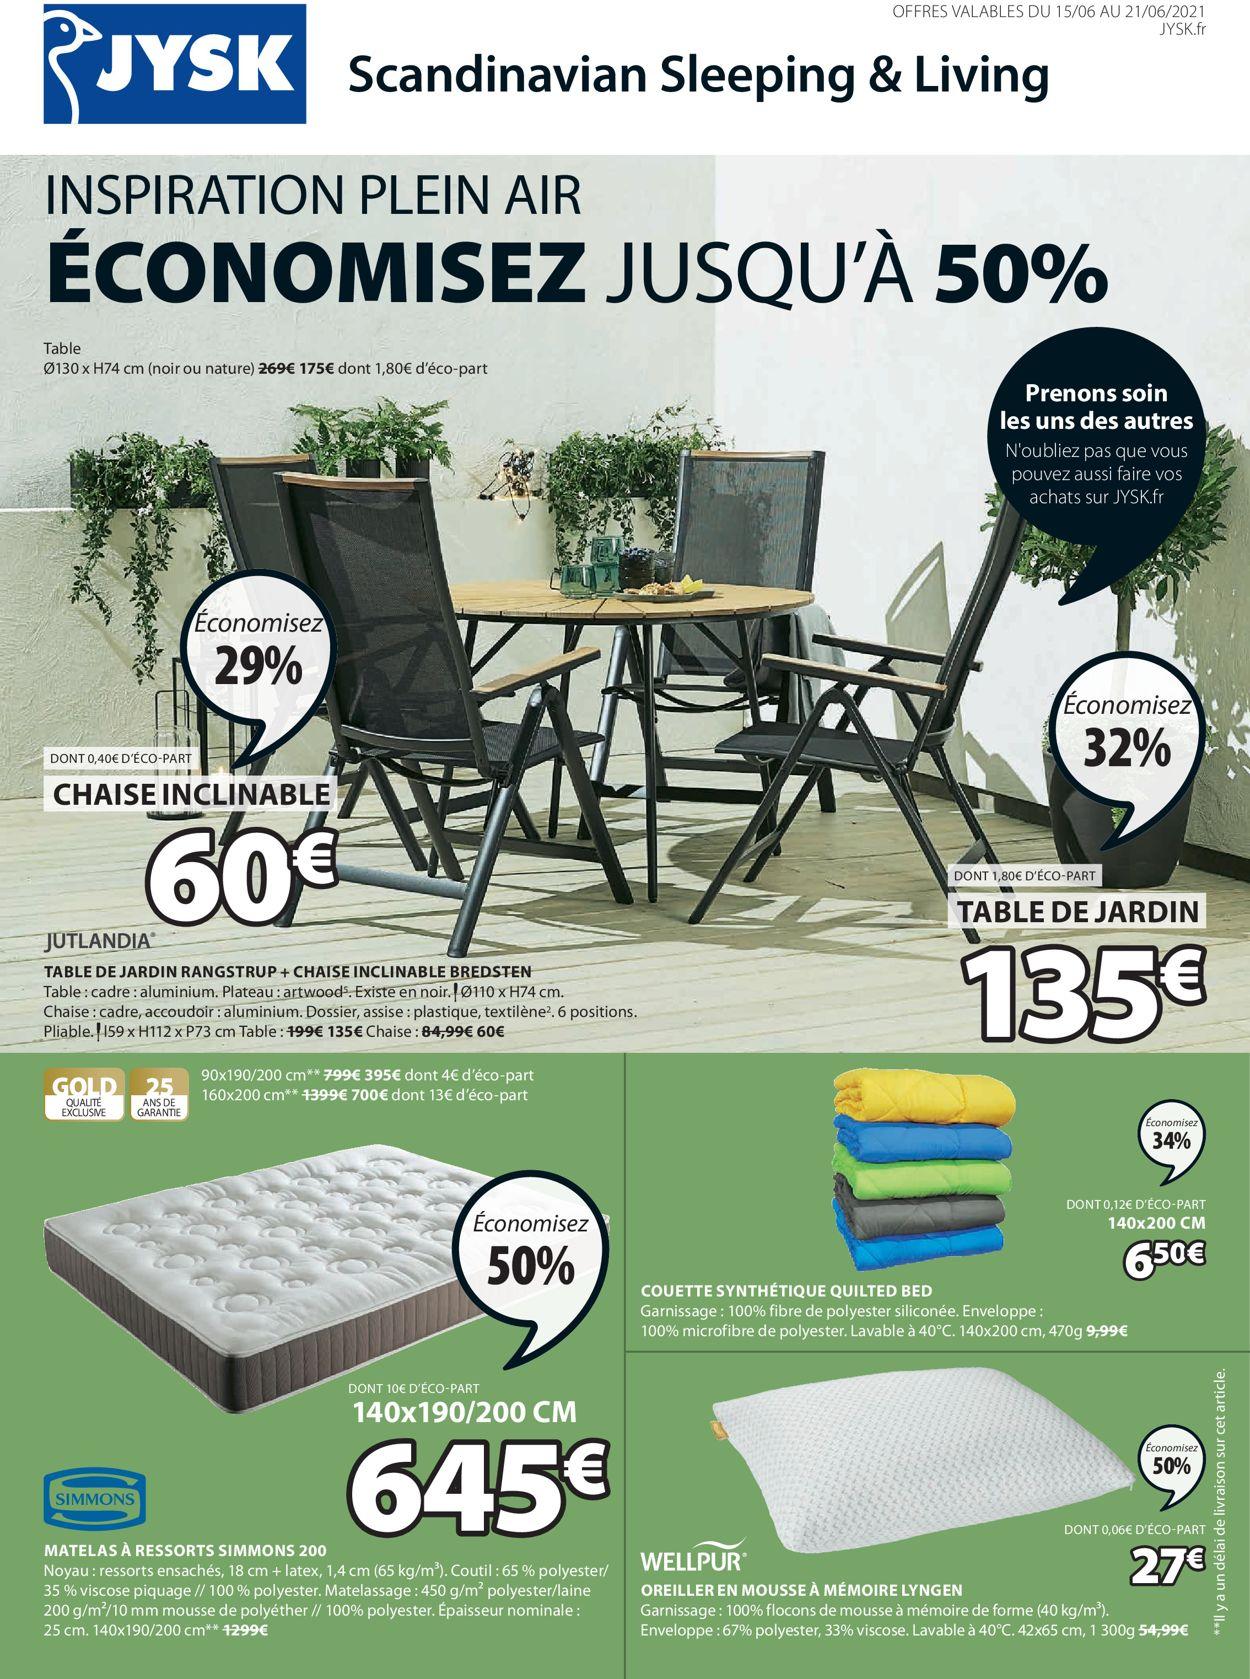 JYSK Catalogue - 15.06-21.06.2021